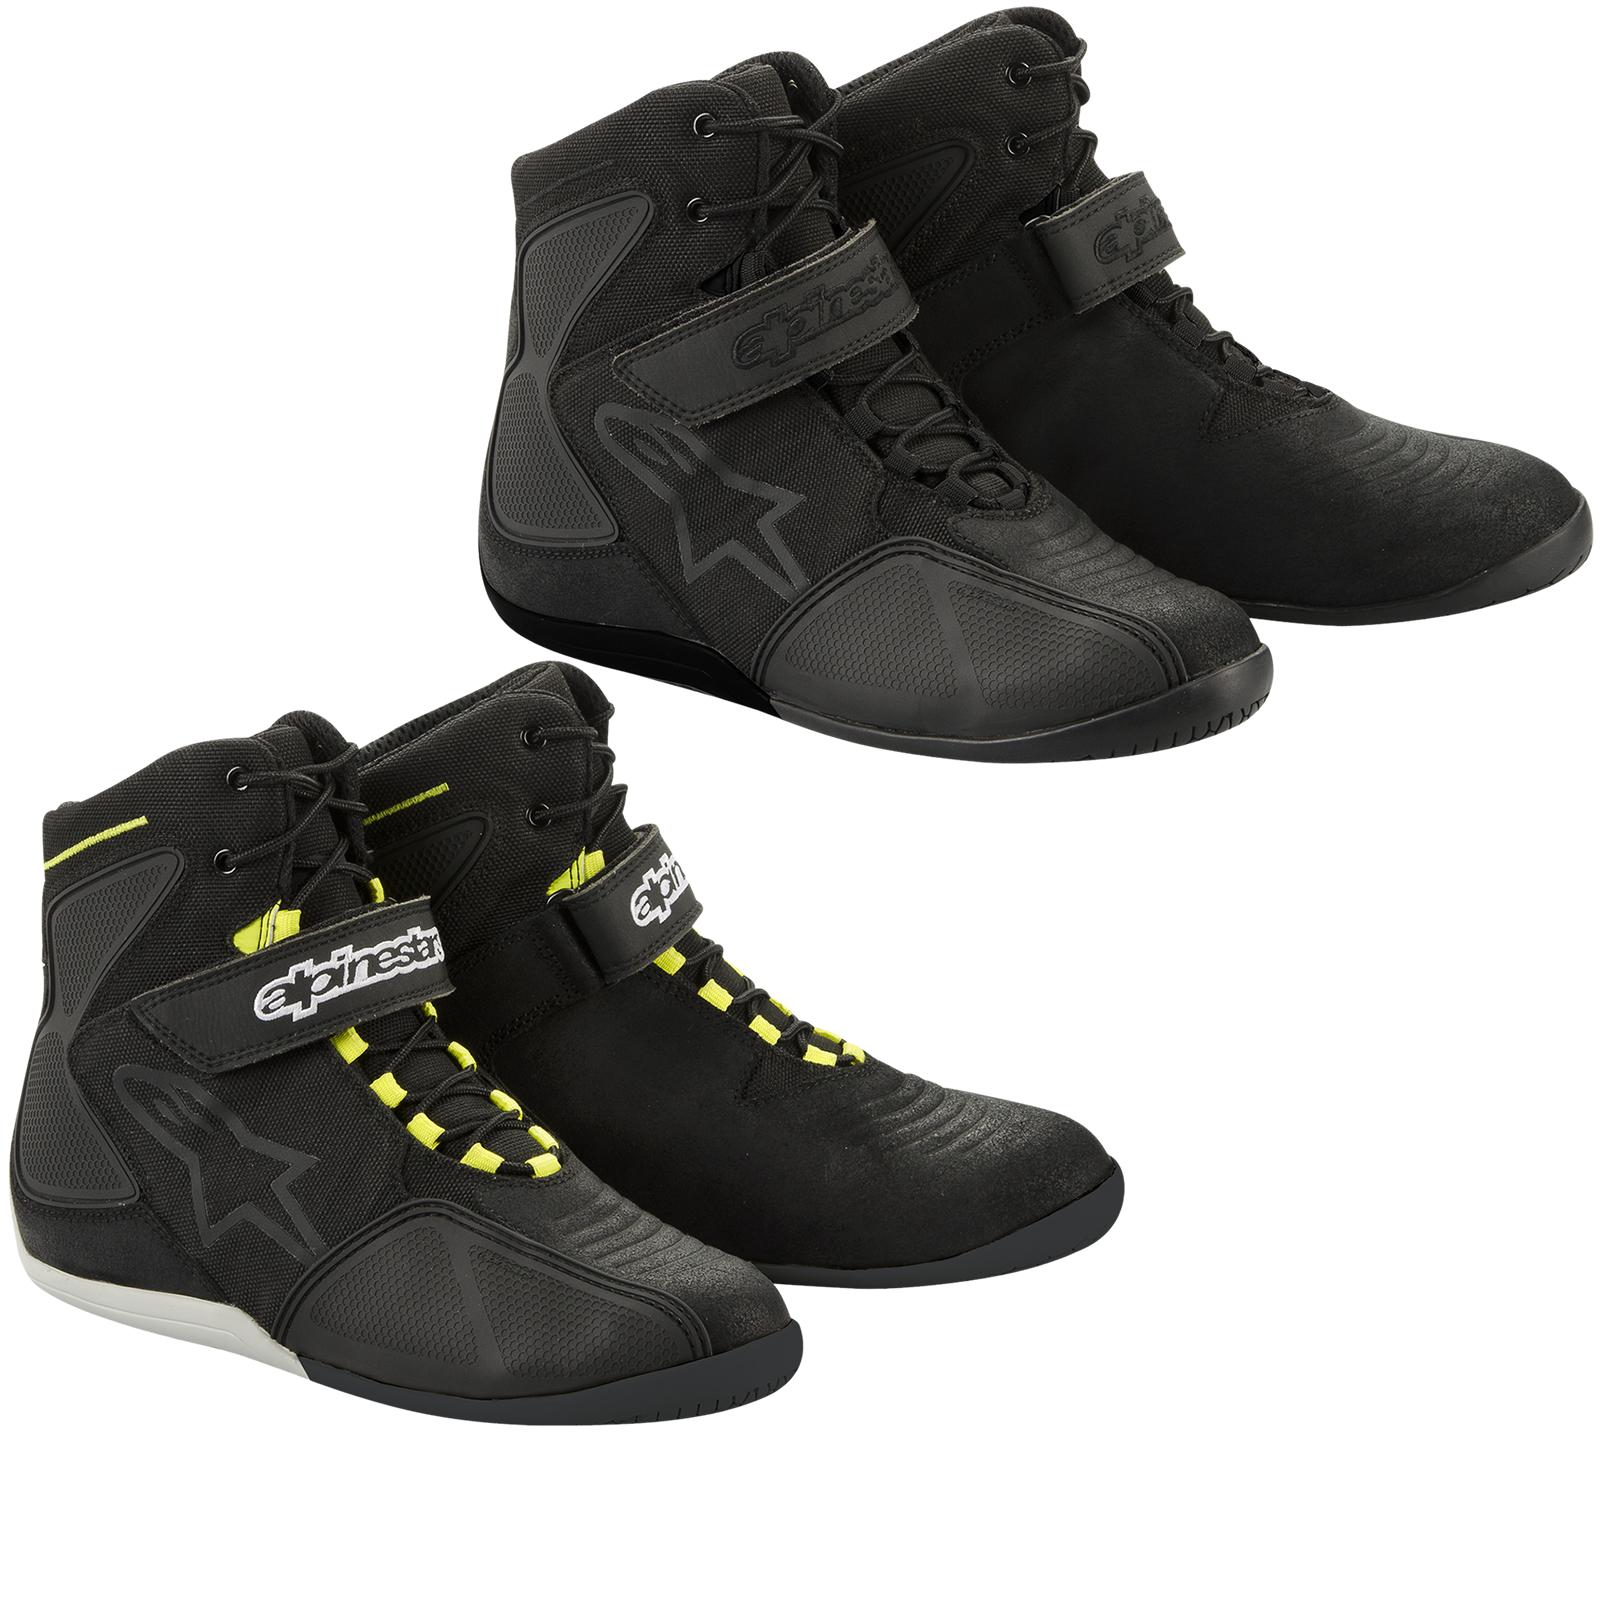 Alpinestars Touring Waterproof Boots